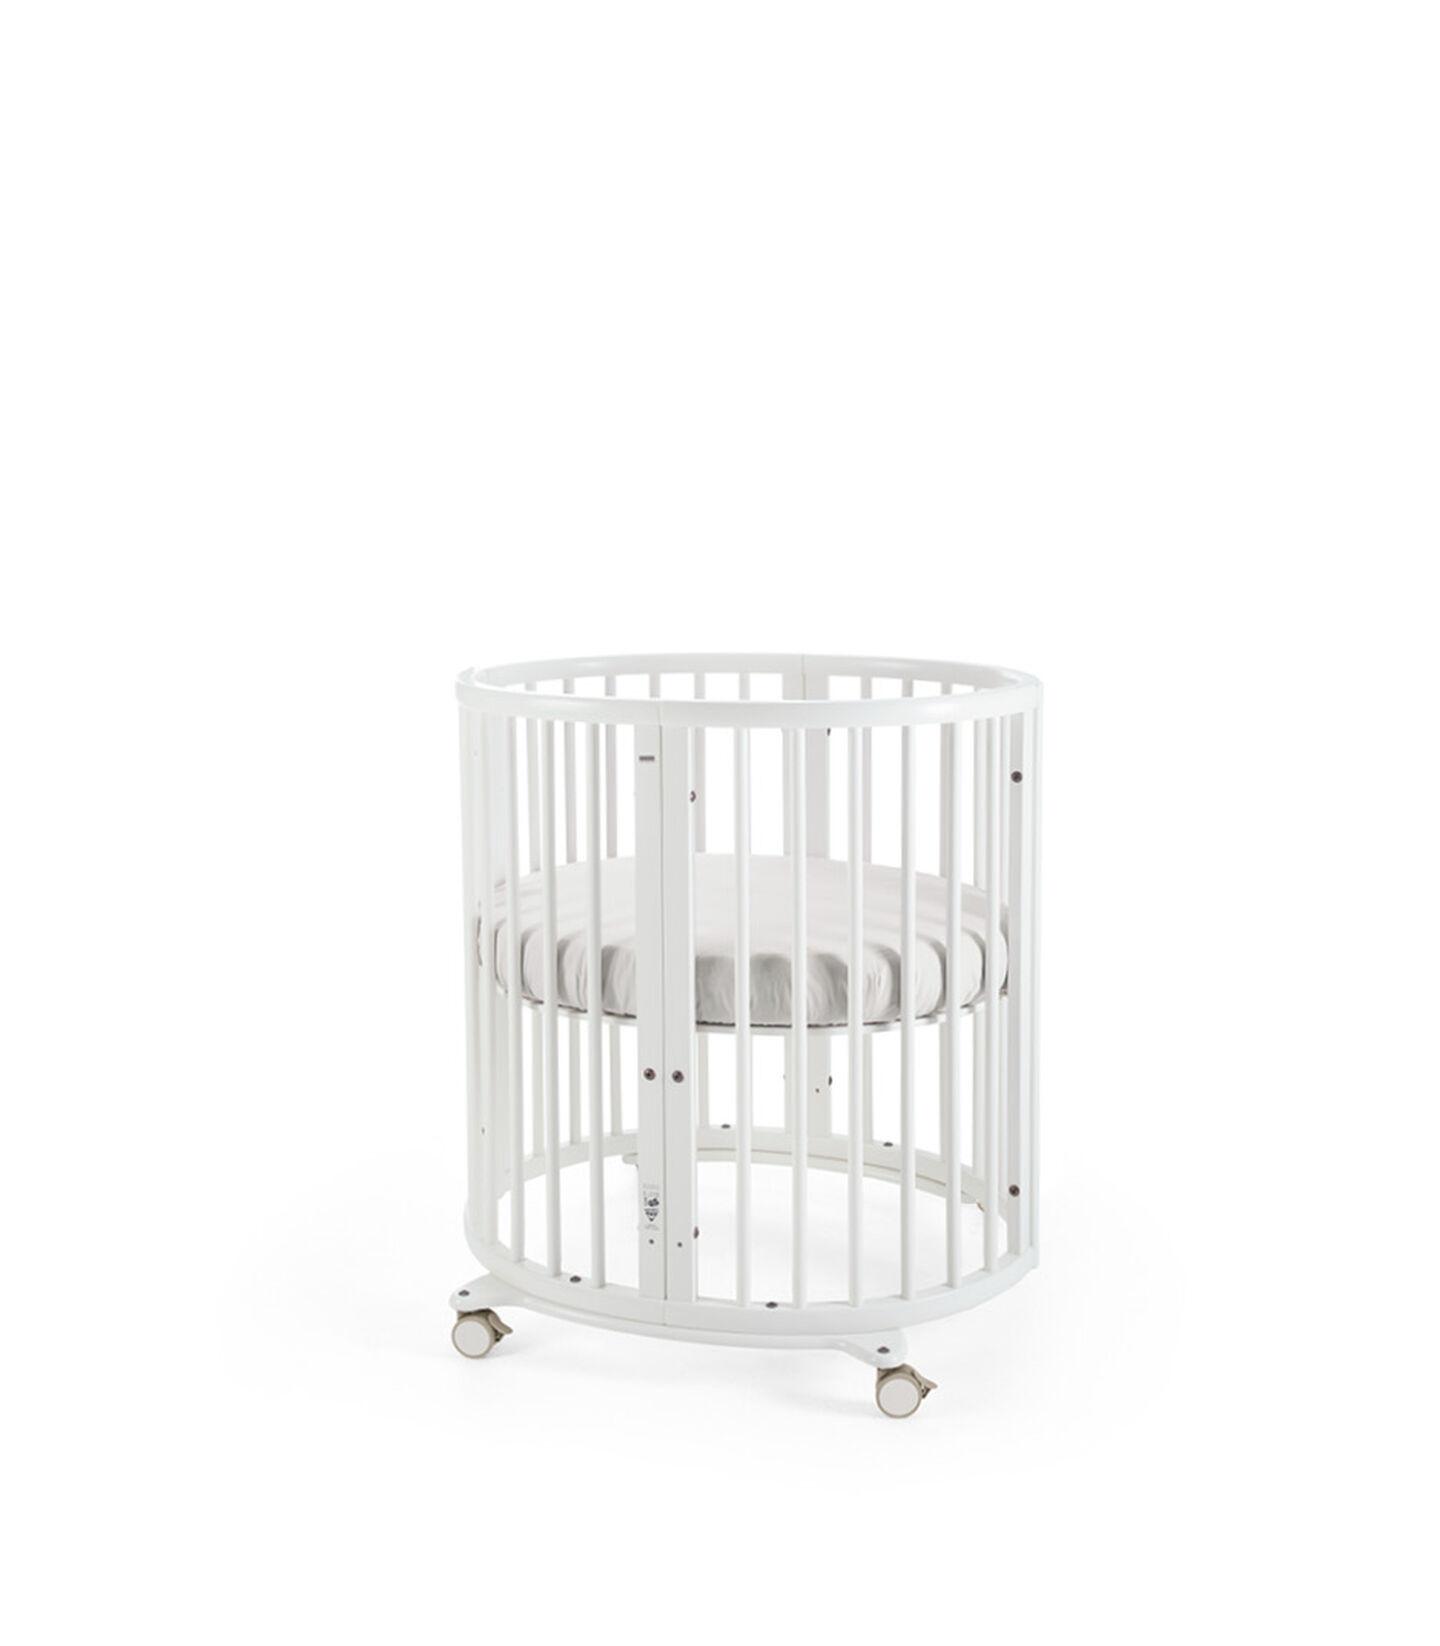 Stokke® Sleepi™ Mini Blanco, Blanco, mainview view 1